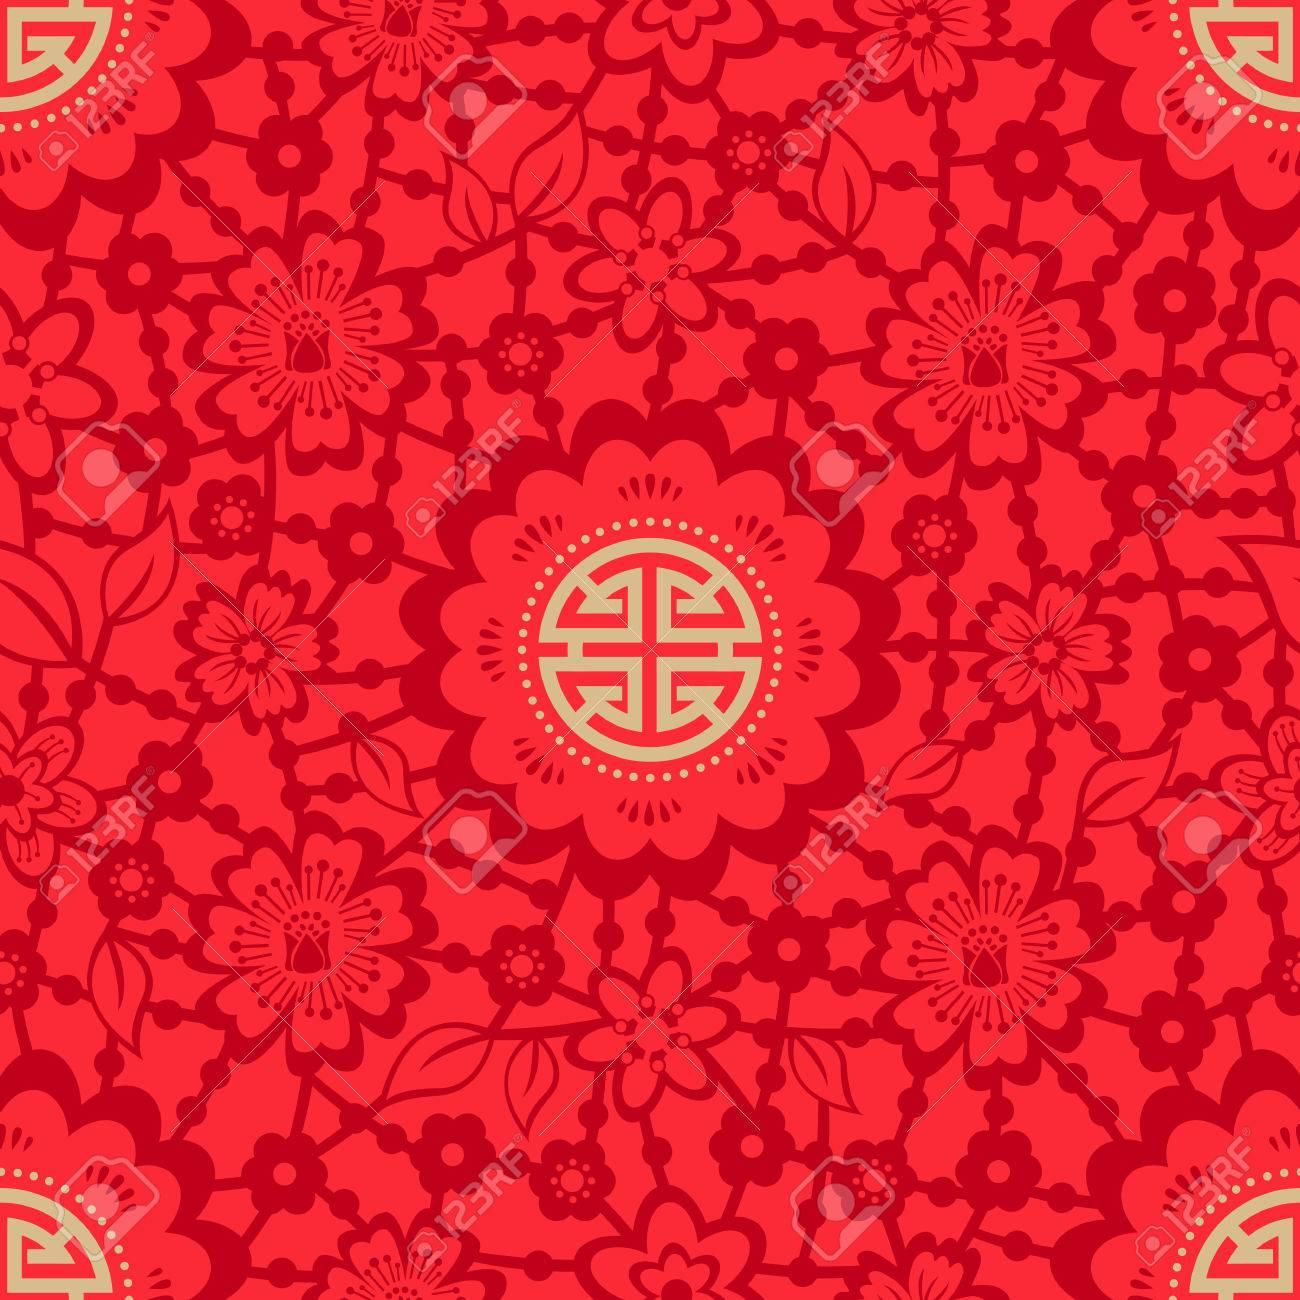 Chinese New Year Seamless - 64037883